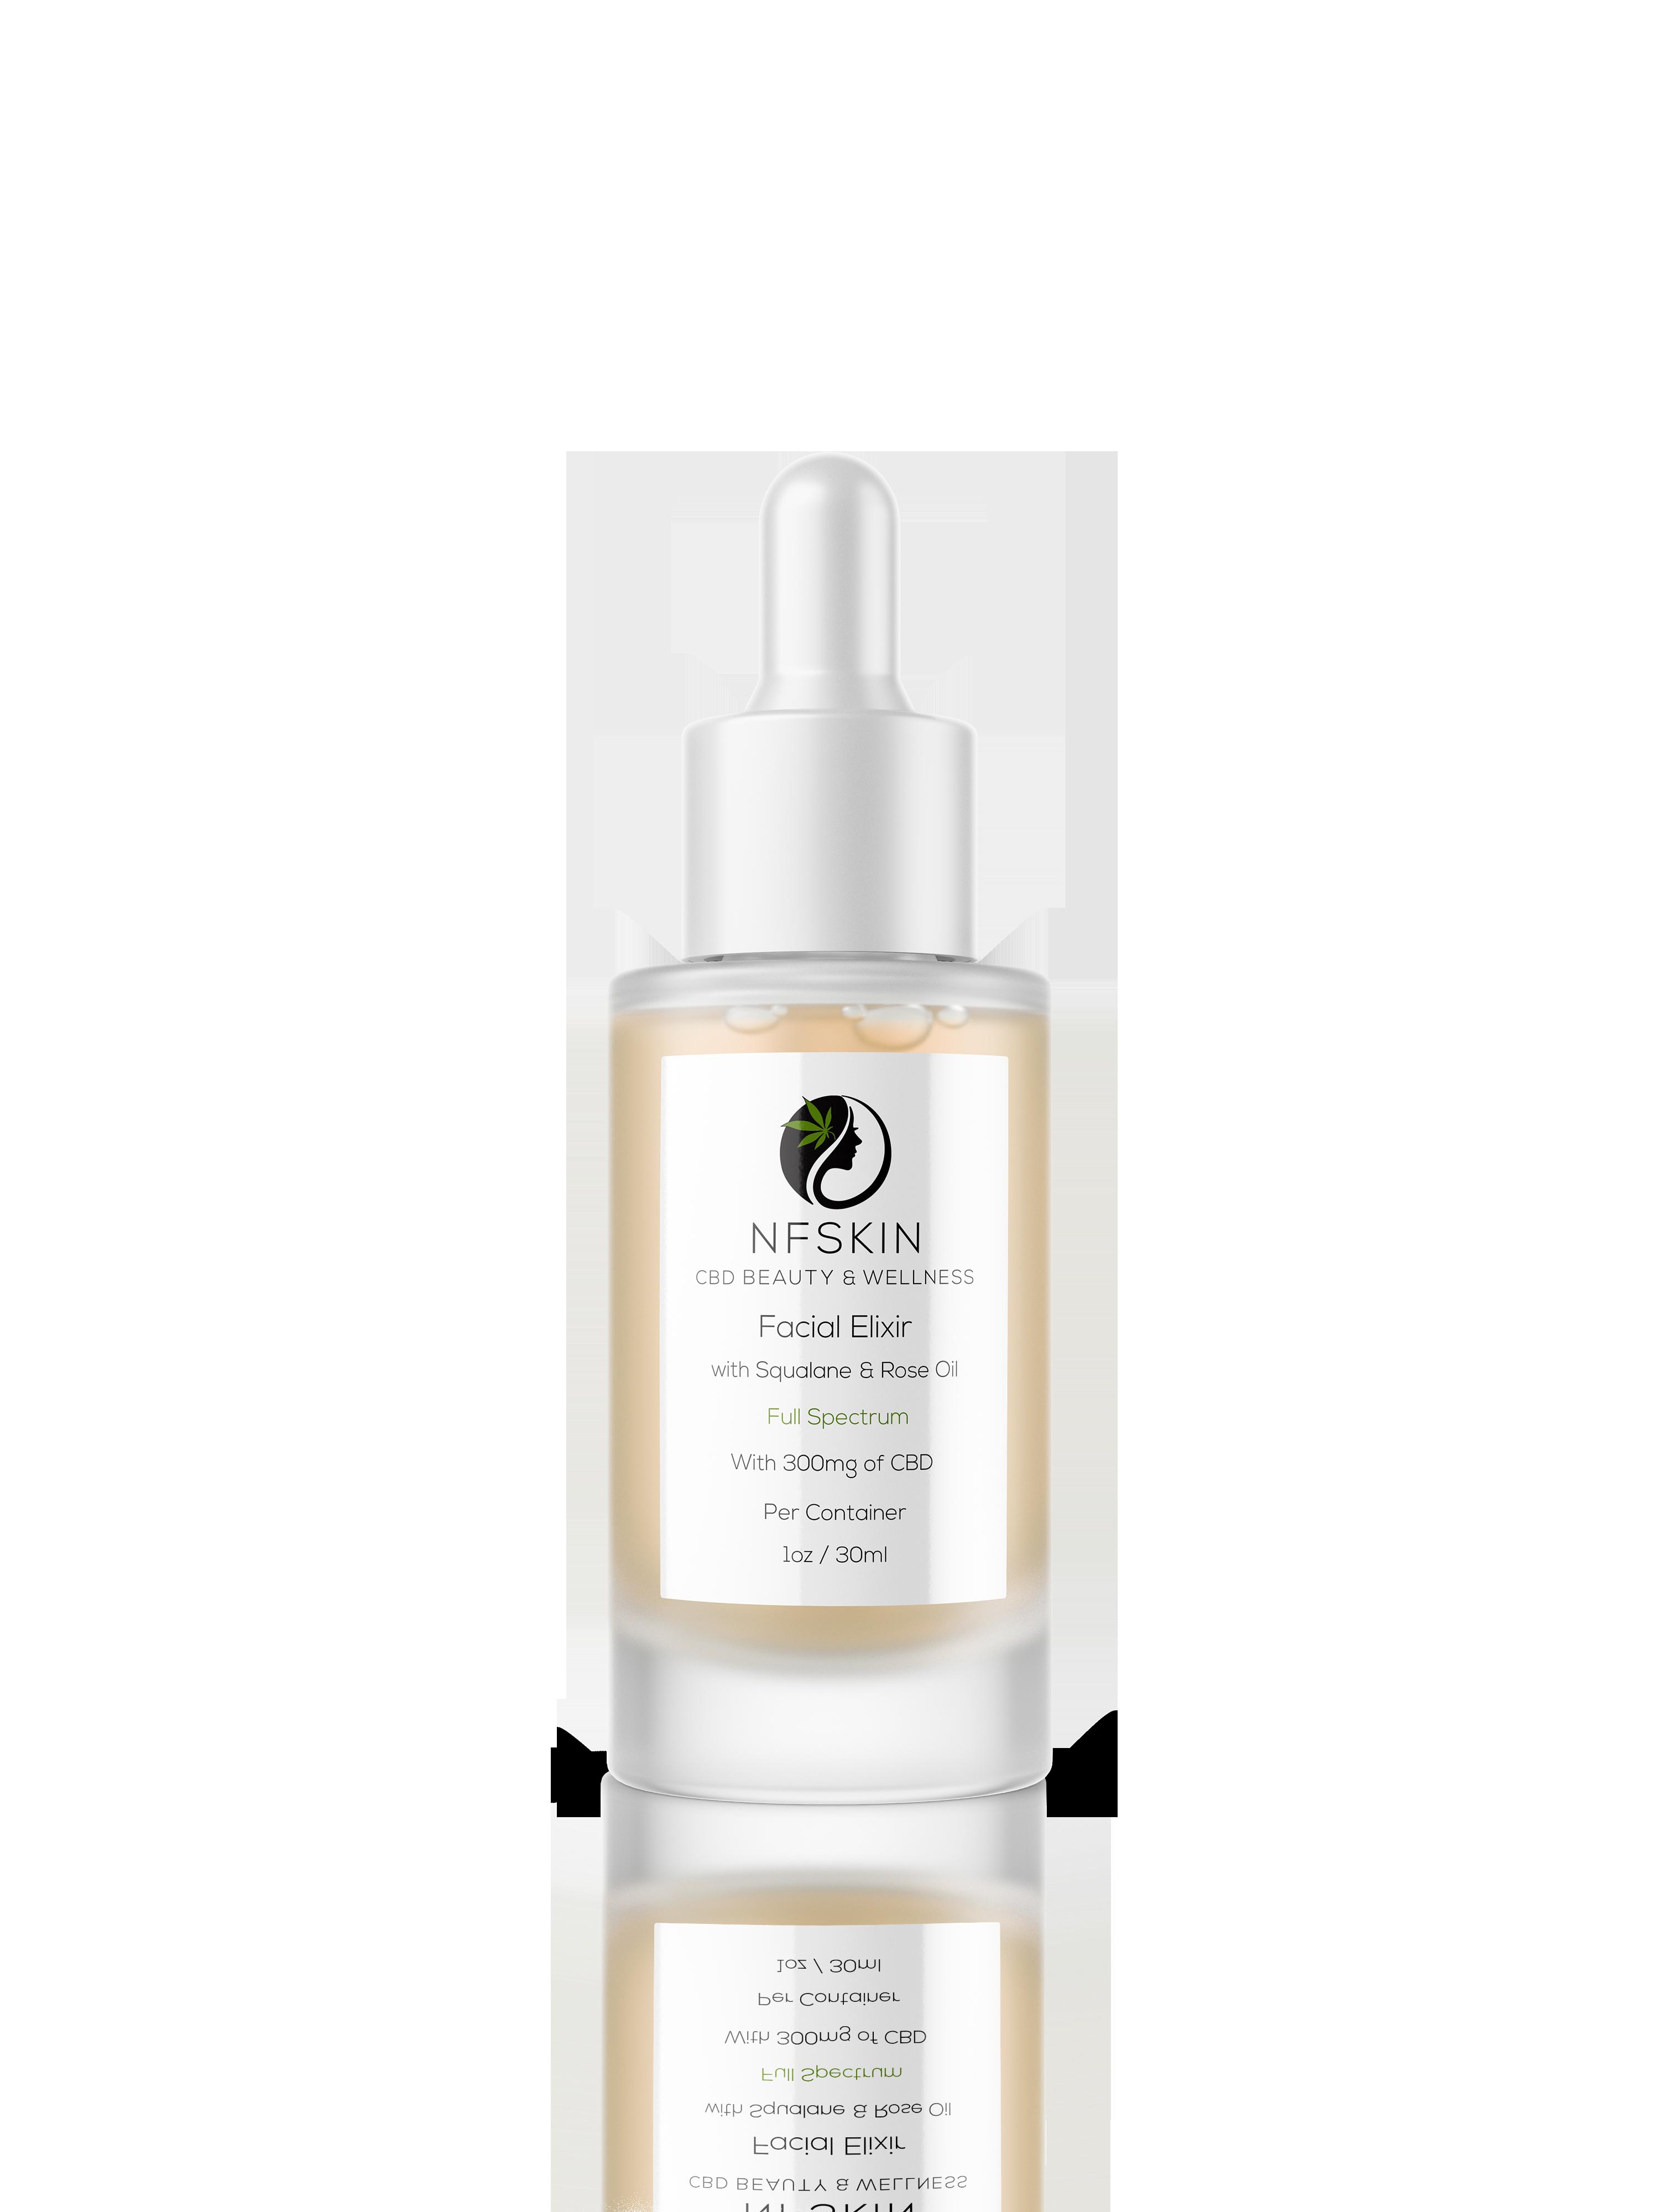 Facial Elixir + Squalane and Rose Oil